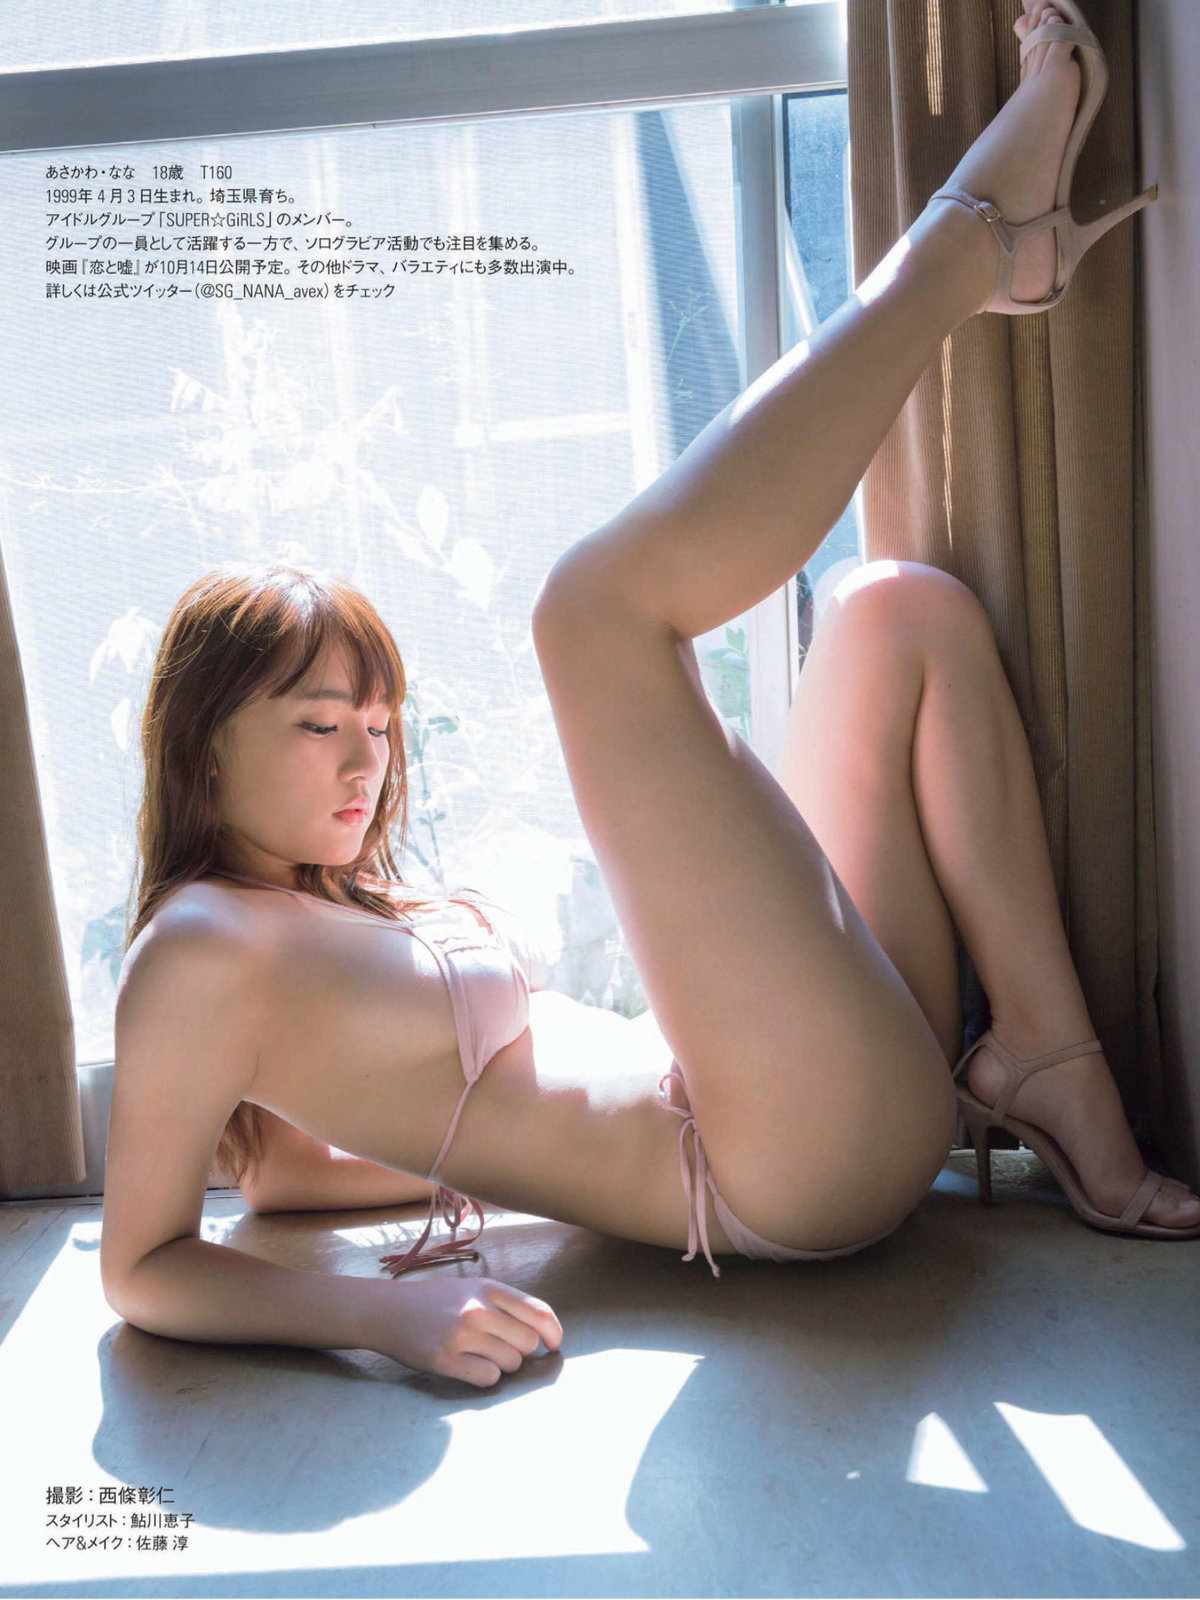 Asakawa Nana 浅川梨奈, FRIDAY 2017.09.29 (フライデー 2017年09月29日号)